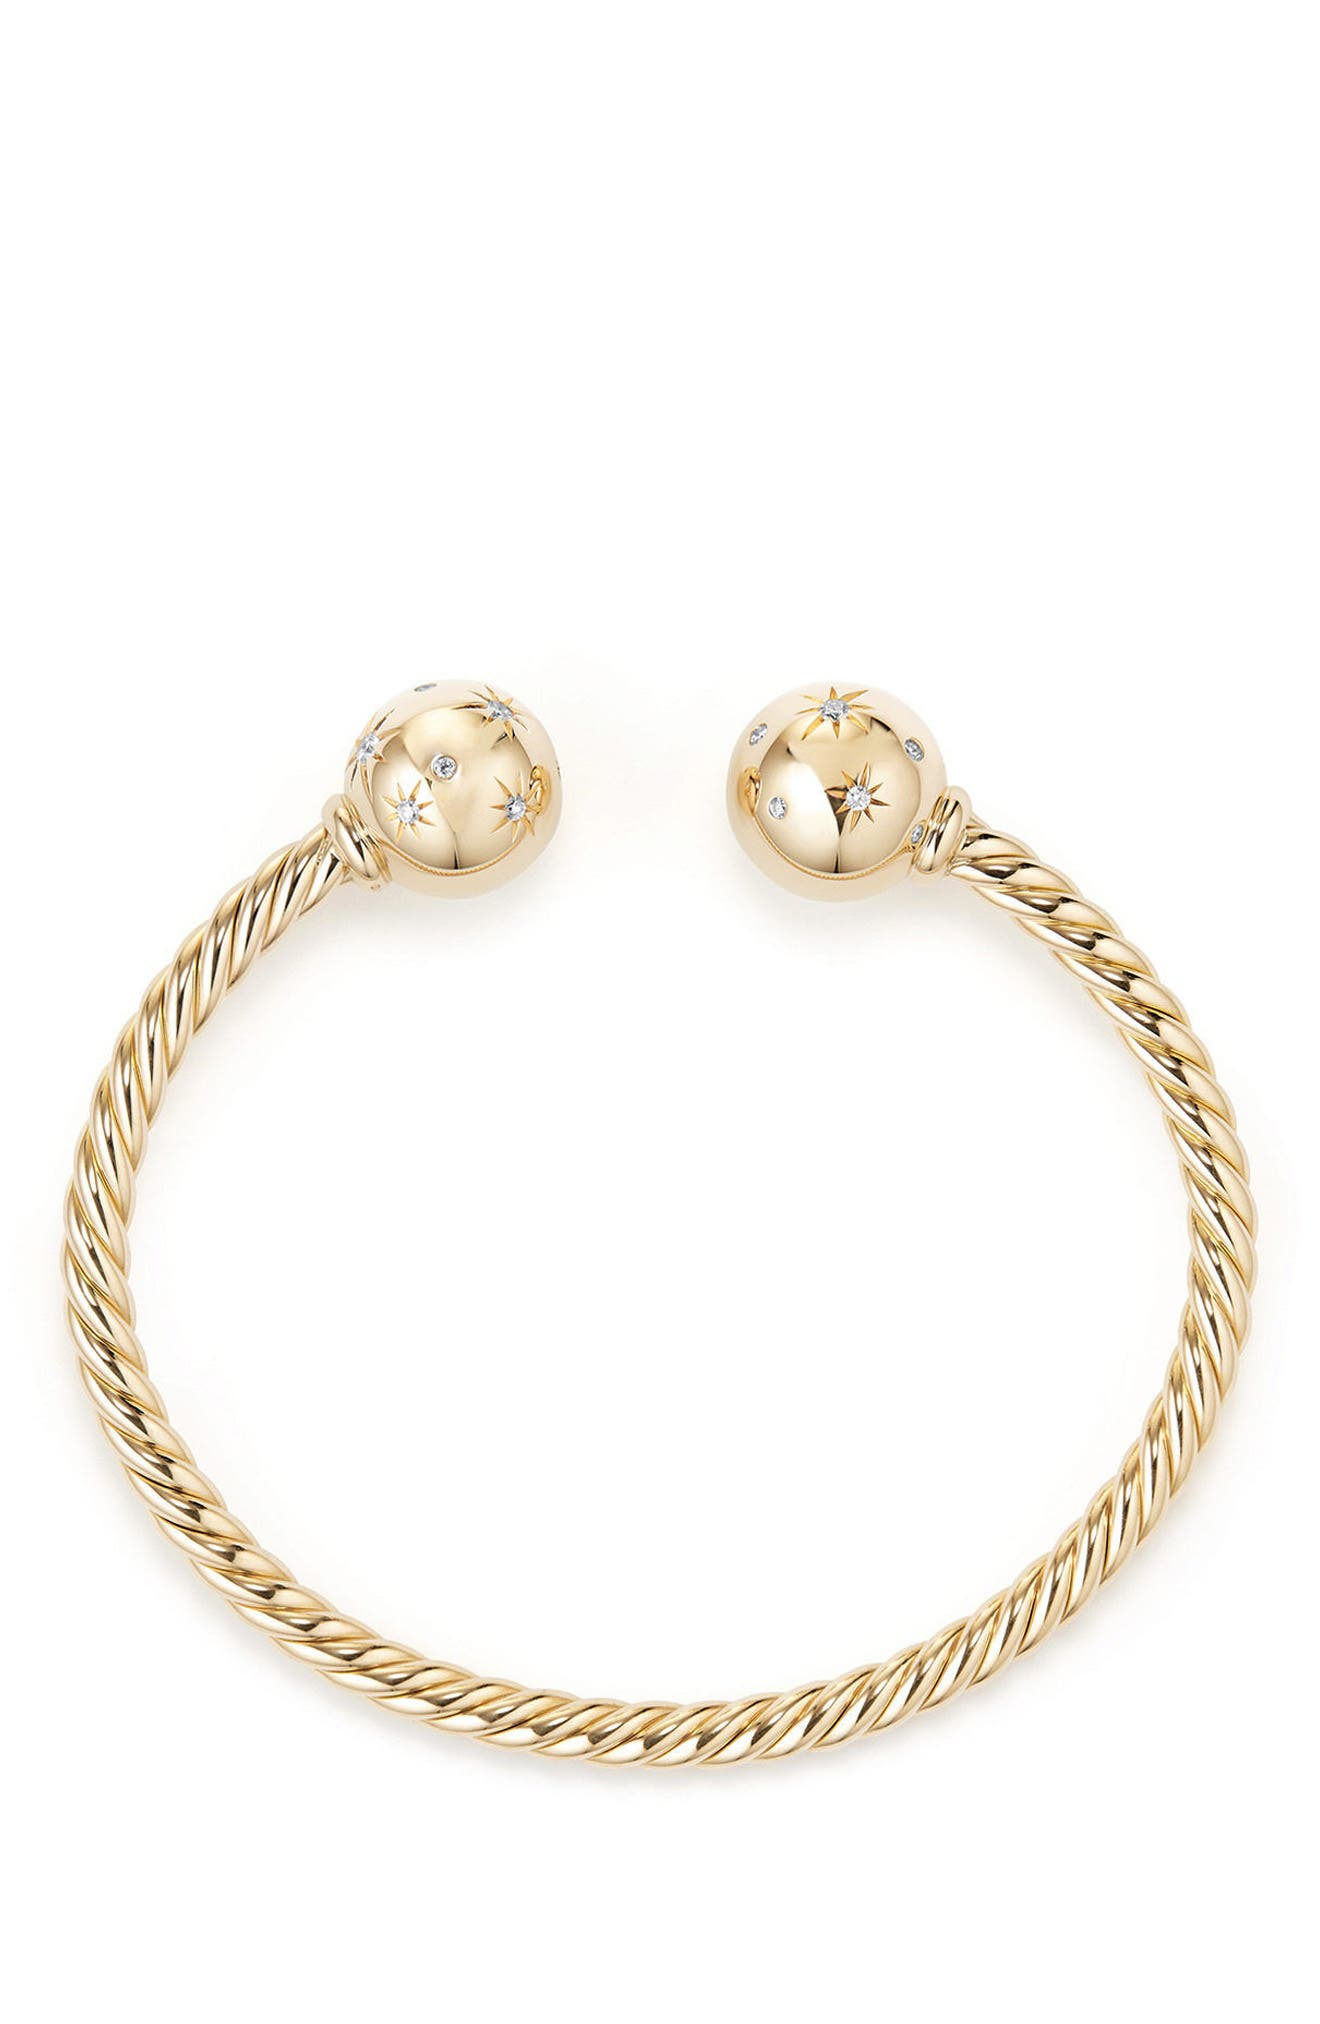 Solari Bead Bracelet with Diamonds in 18K Gold,                             Alternate thumbnail 2, color,                             Yellow Gold